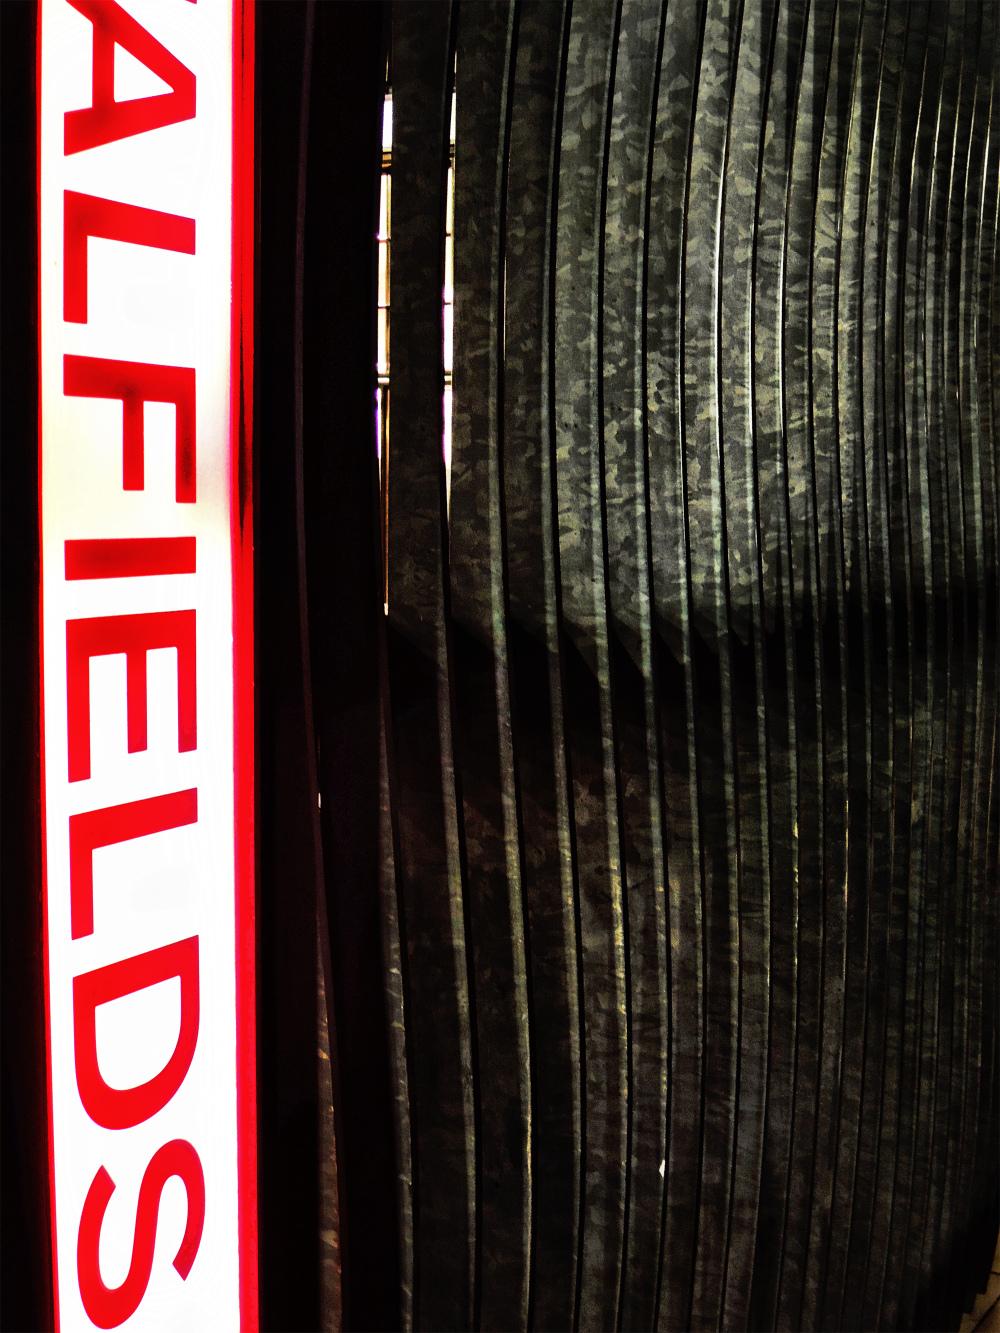 spitalfields market london england gate